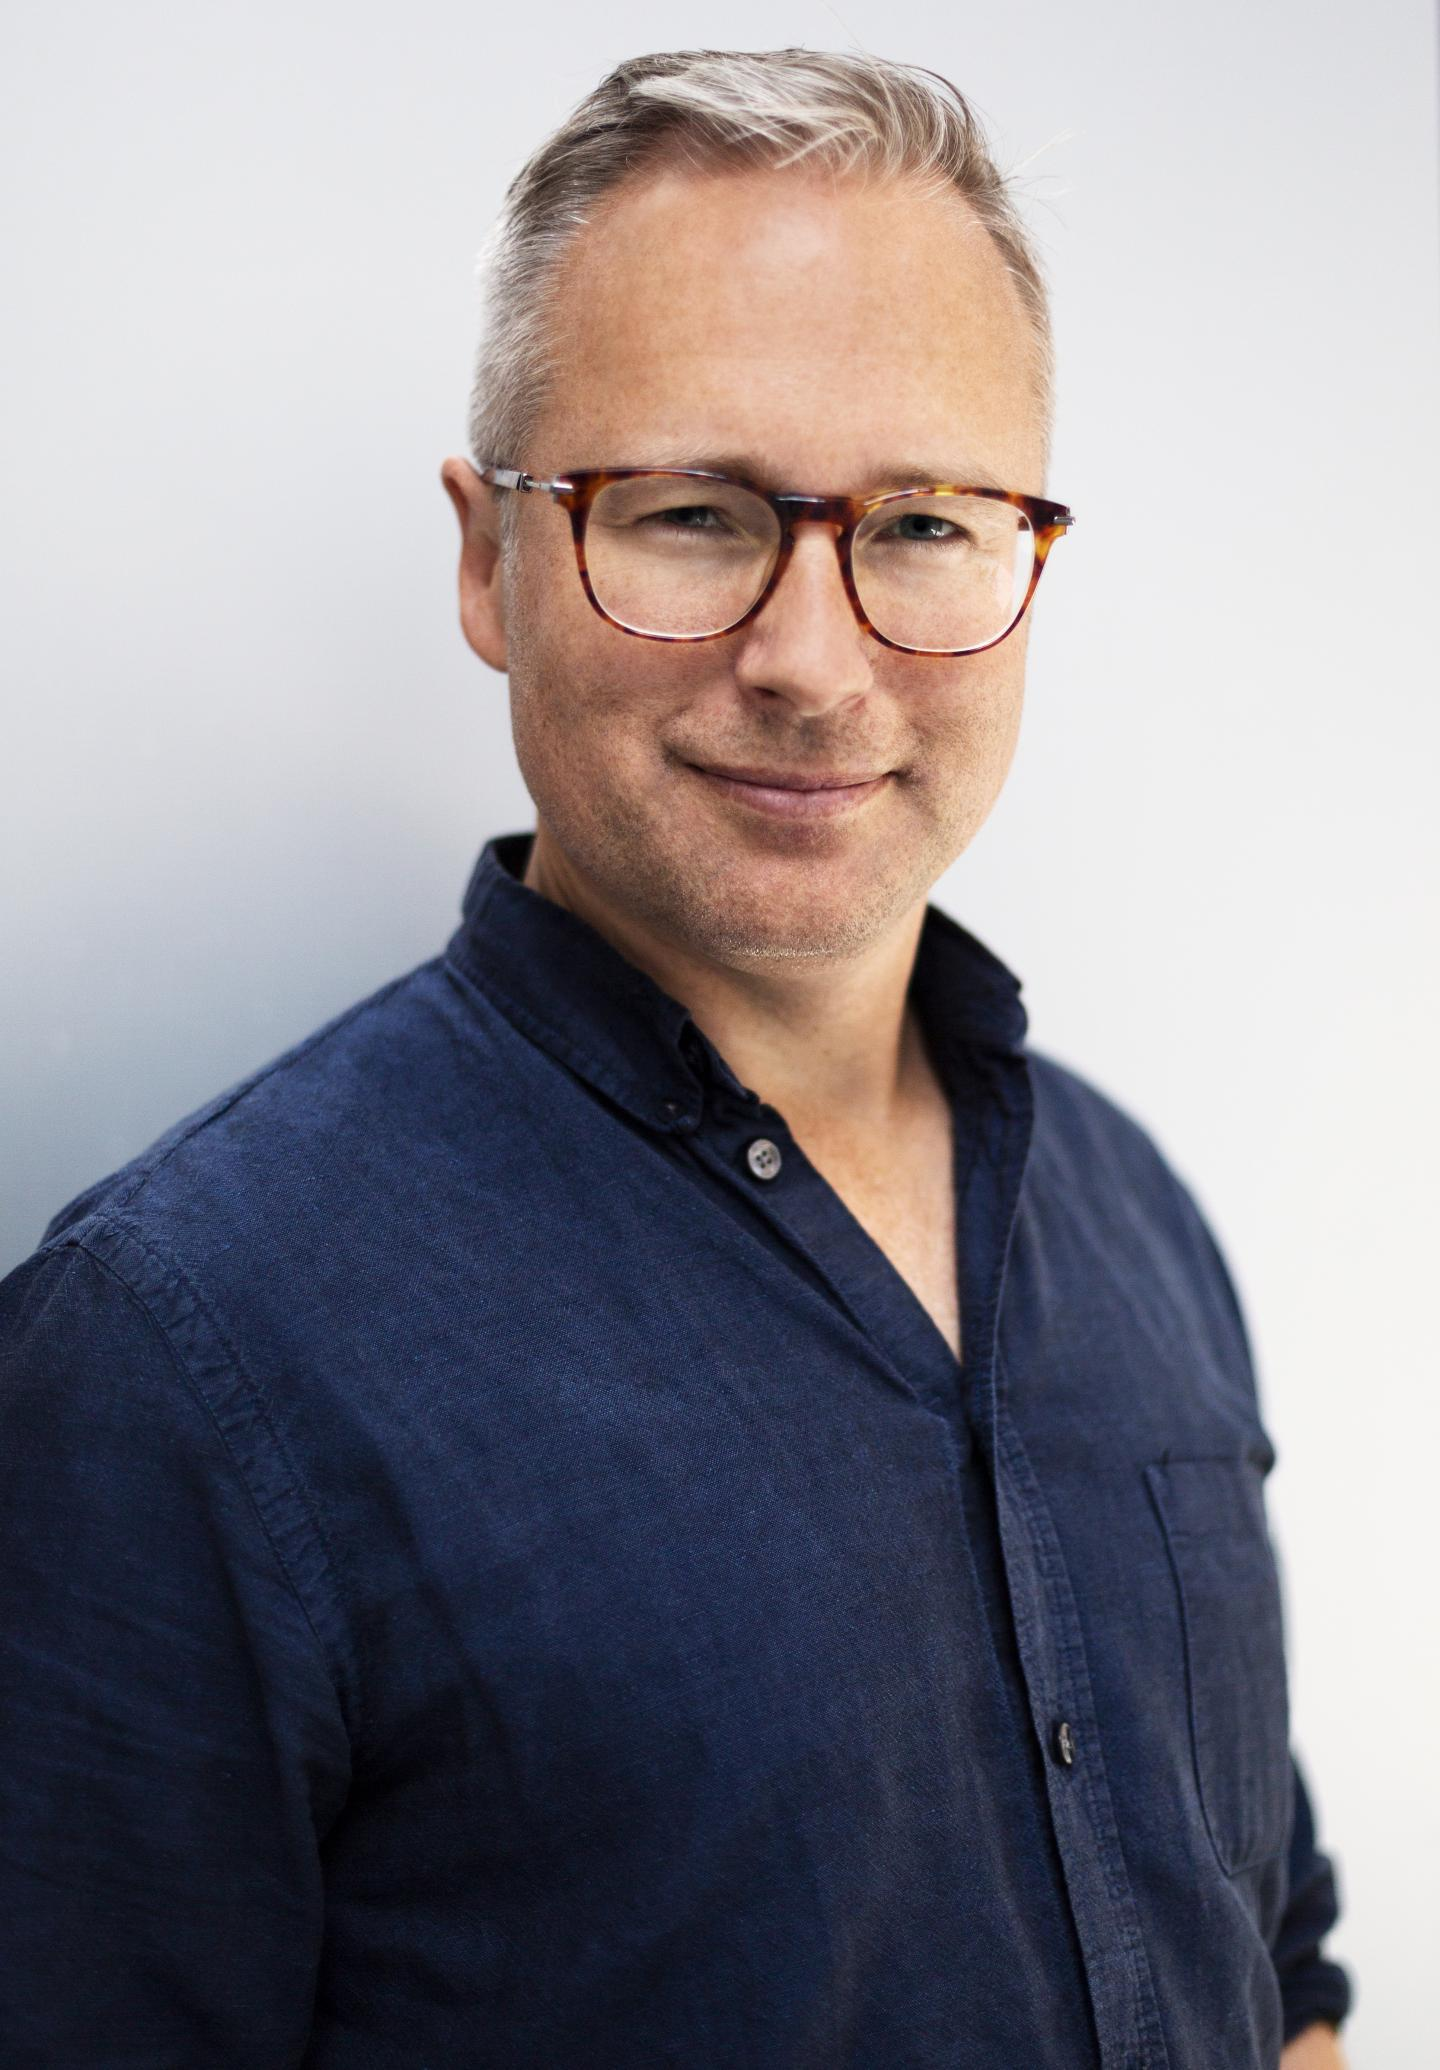 Fredrik Strand